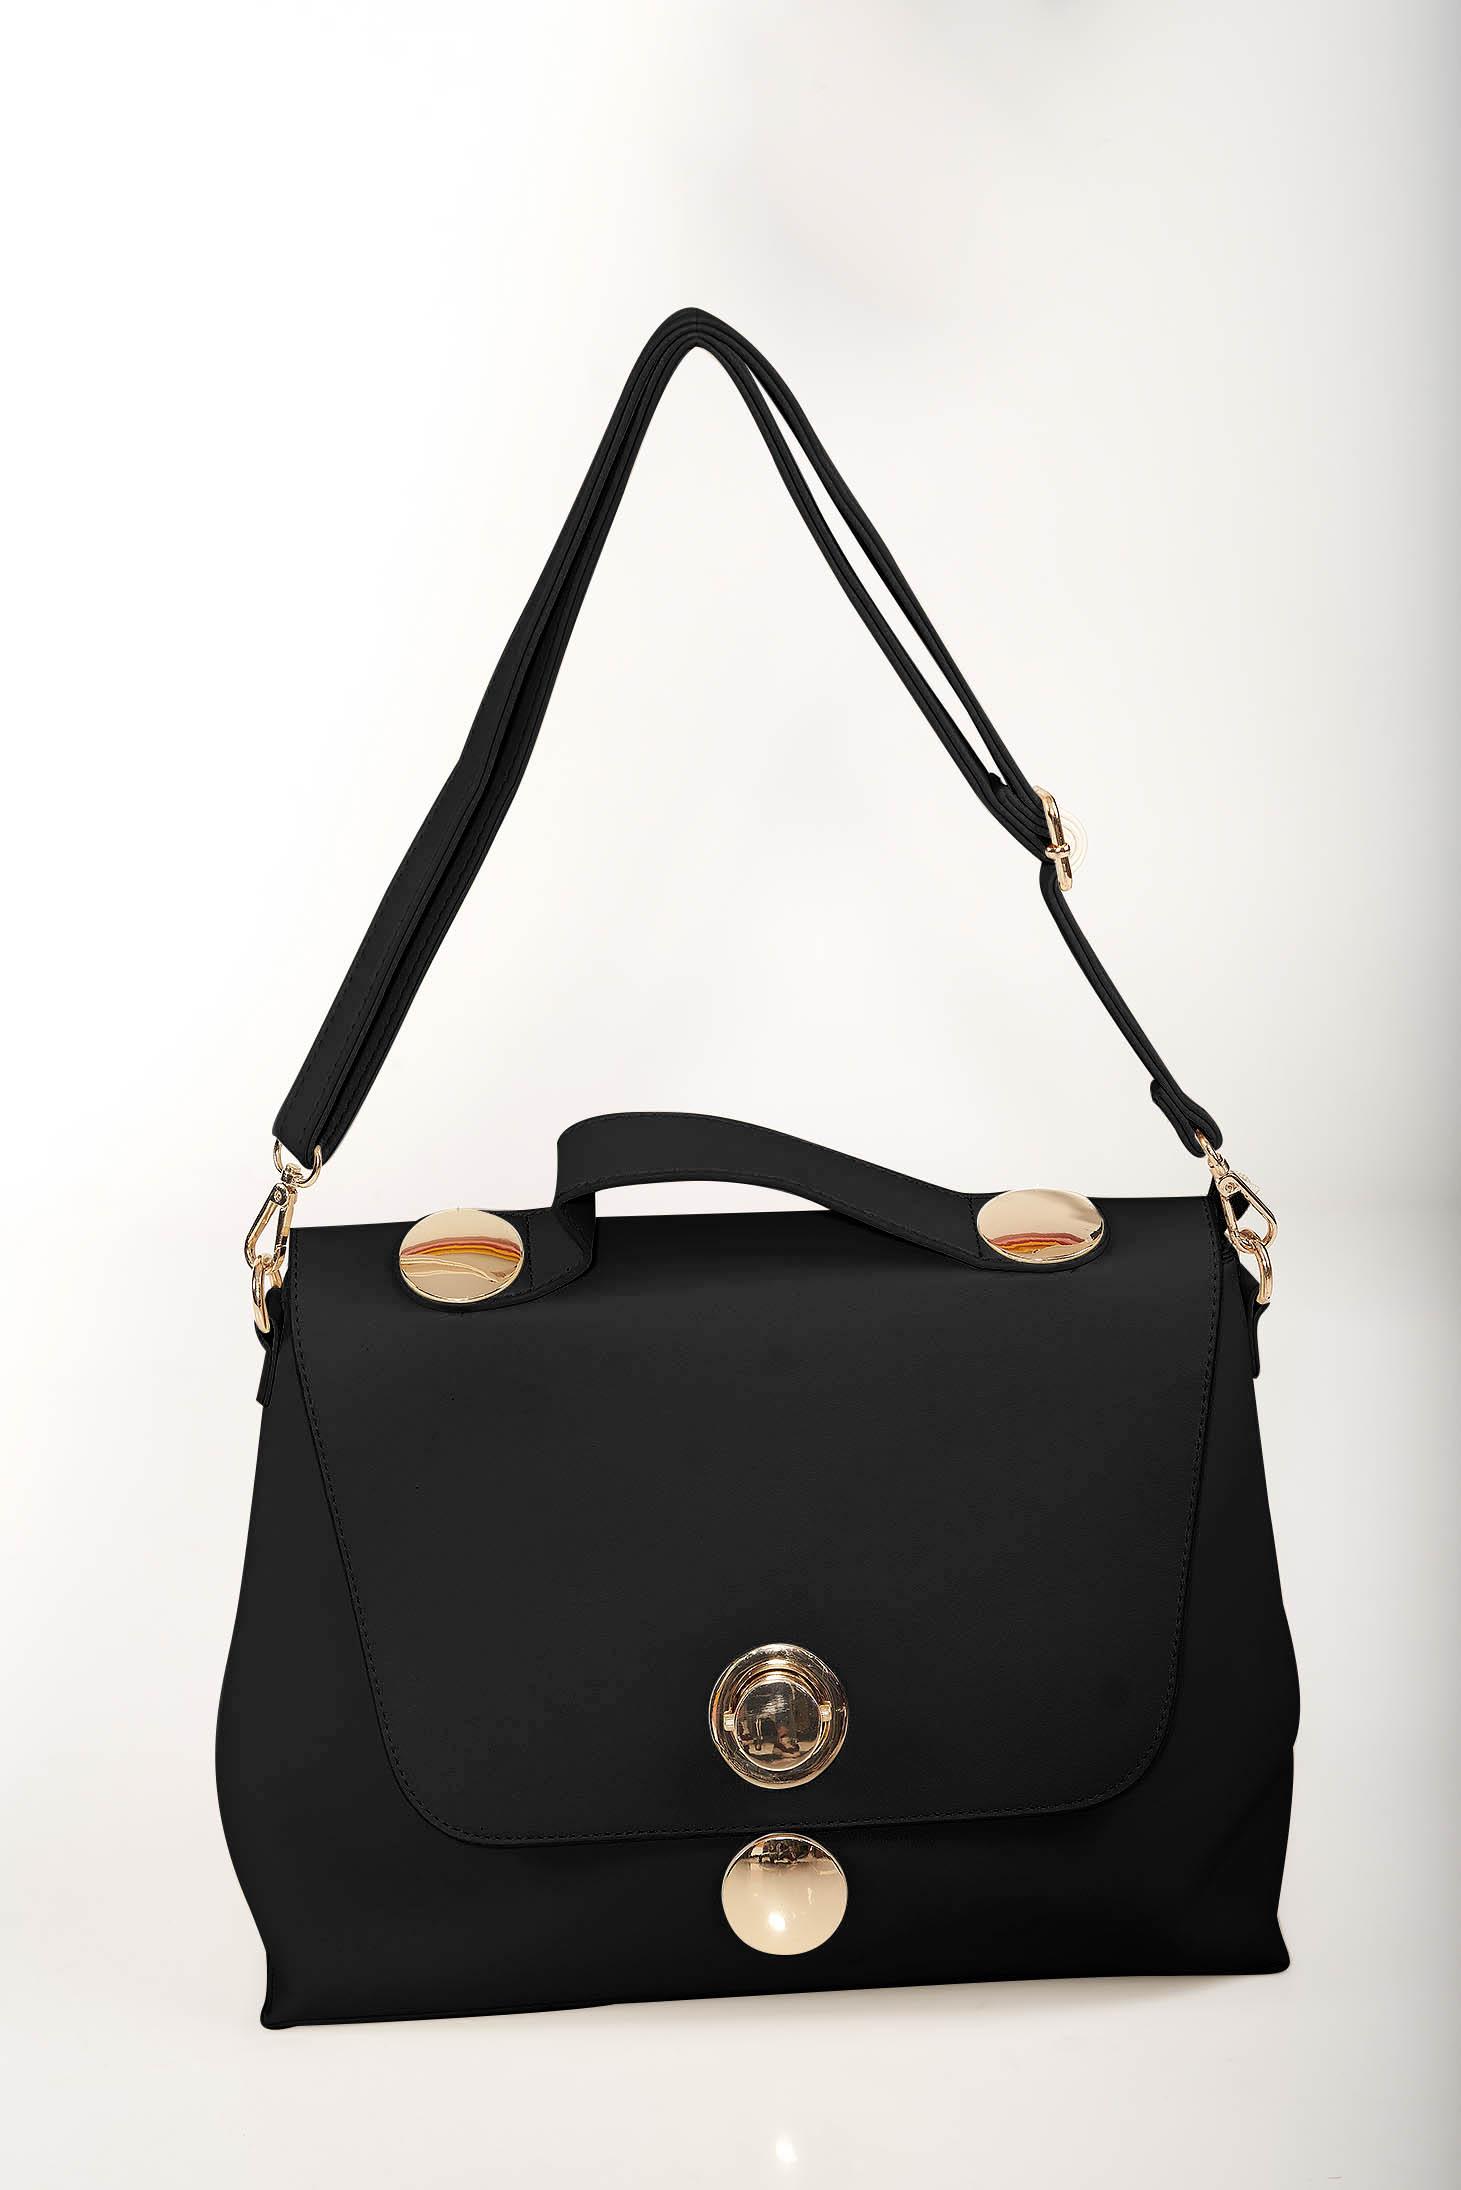 Black elegant bag faux leather golden metallic details dettachable shoulder strap